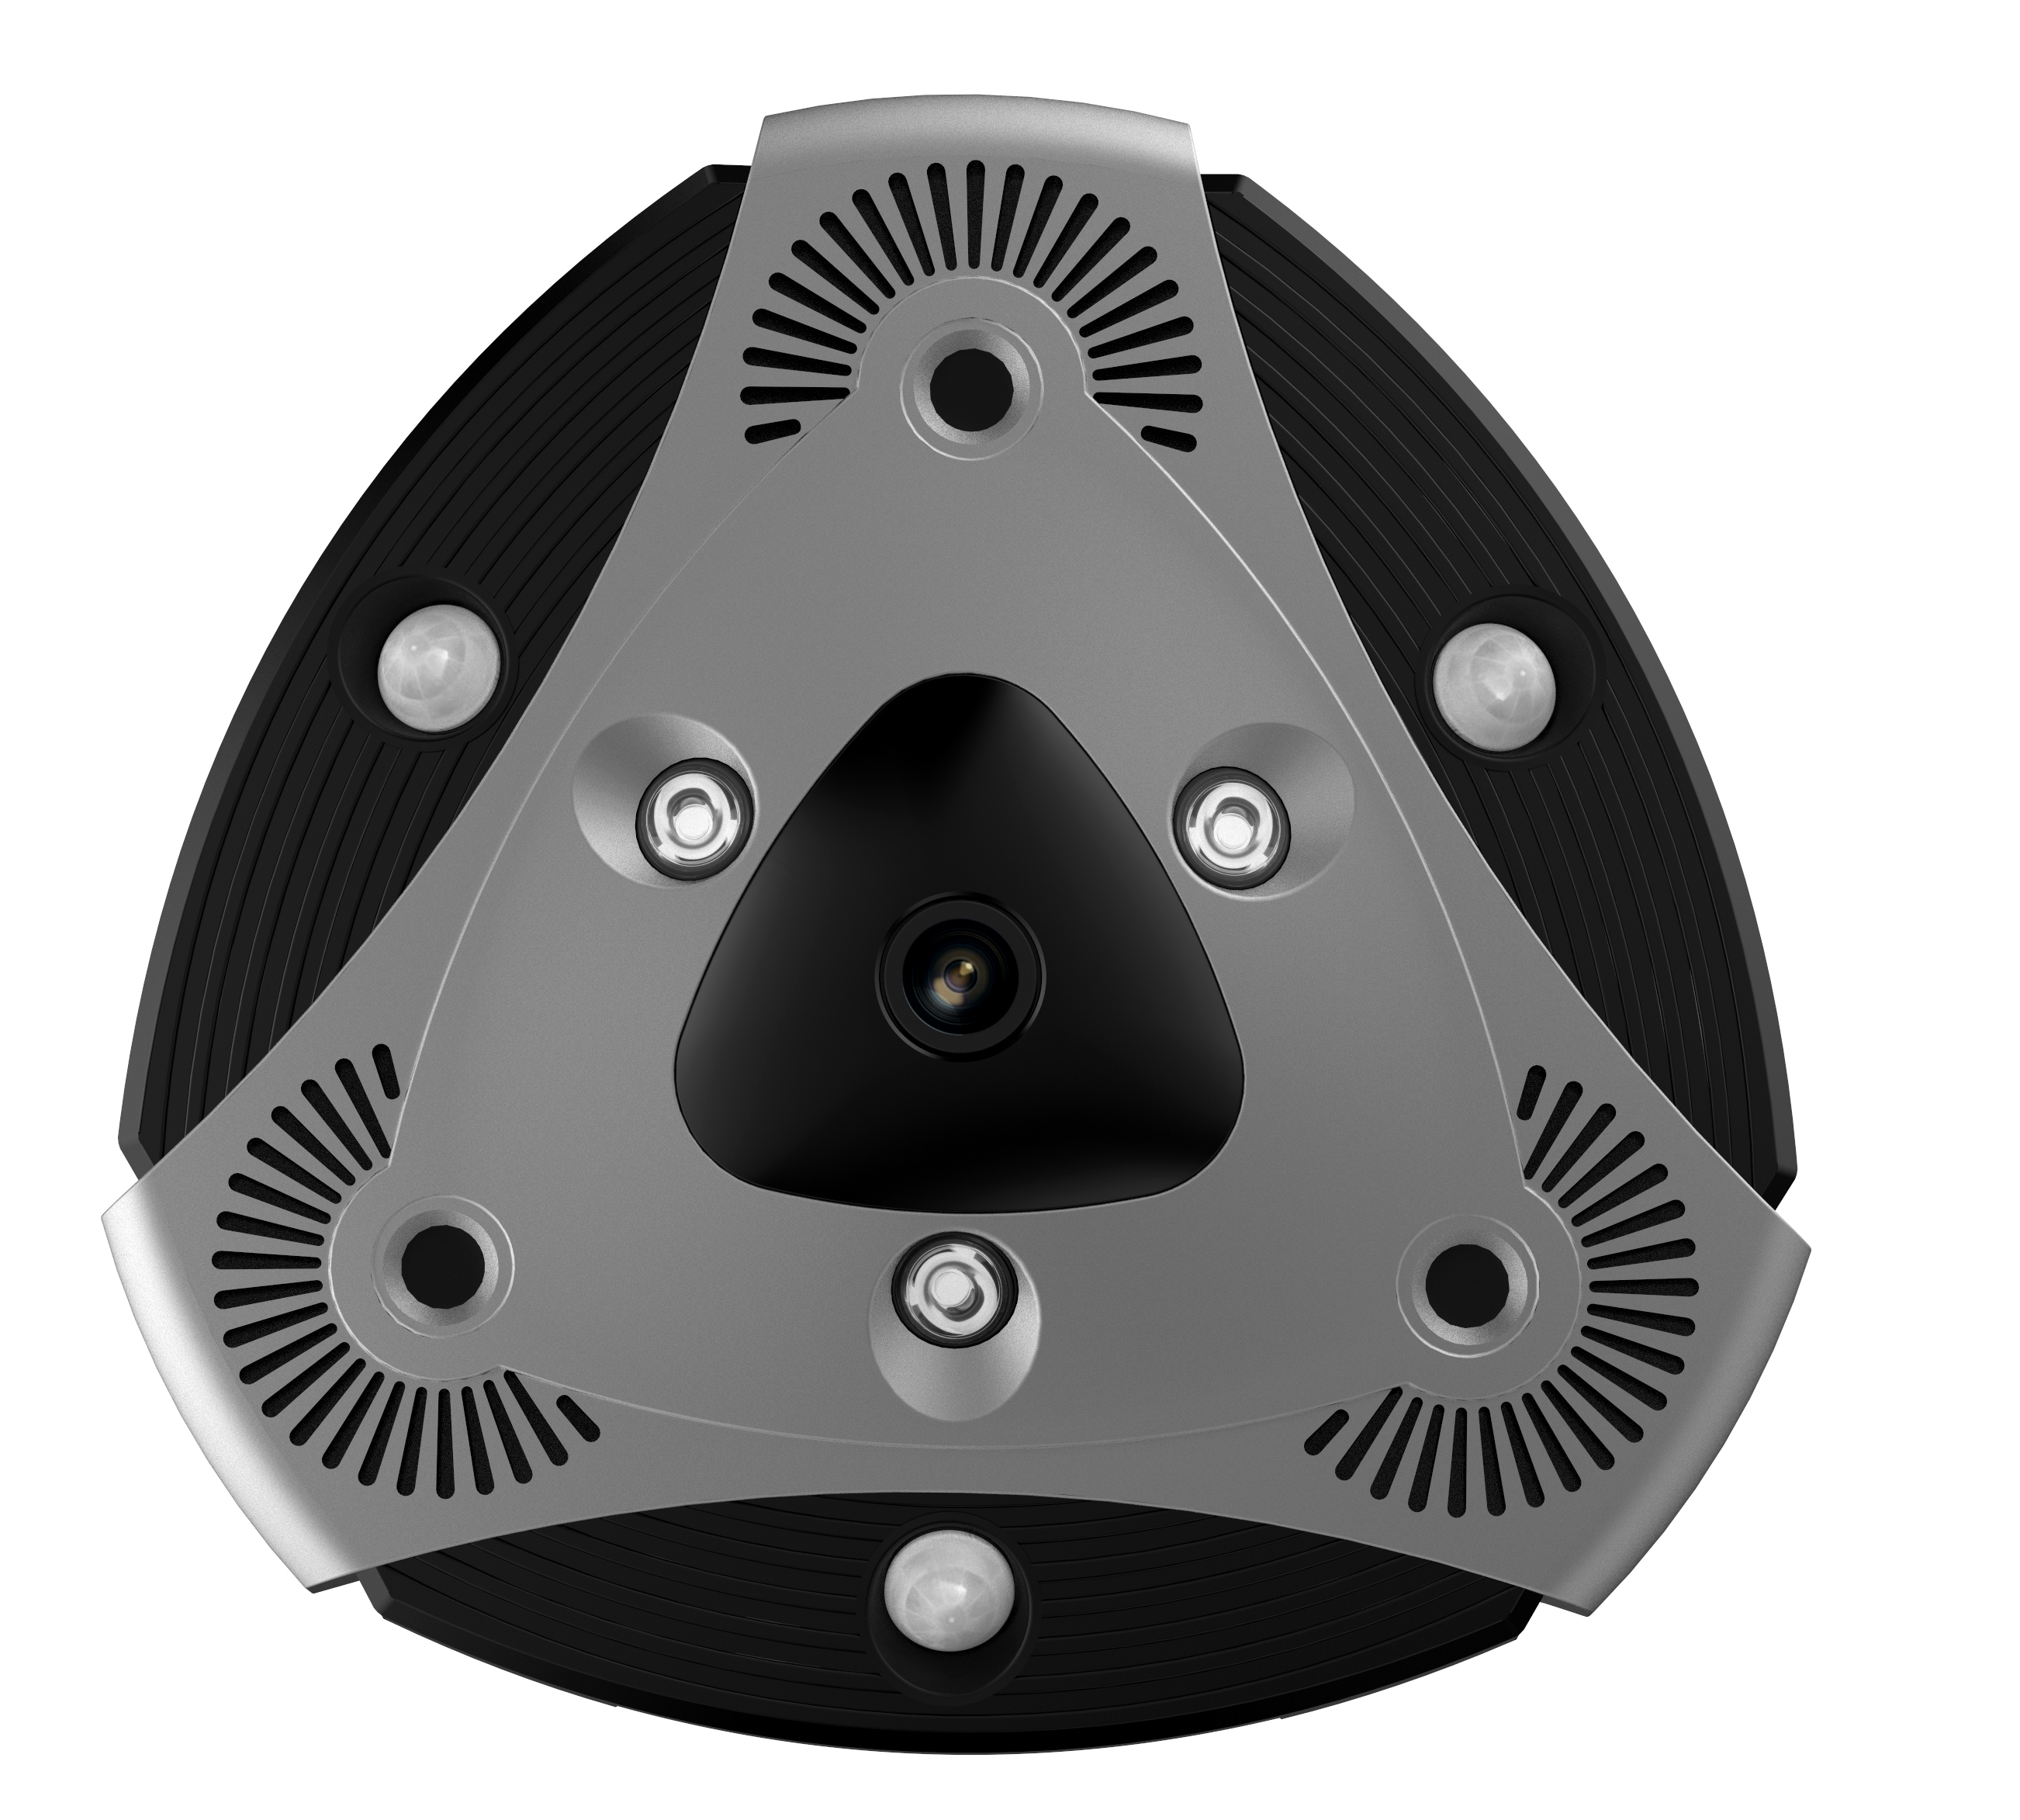 Best Home Alarm Fog Machine Security - Buy Fog Machine ...